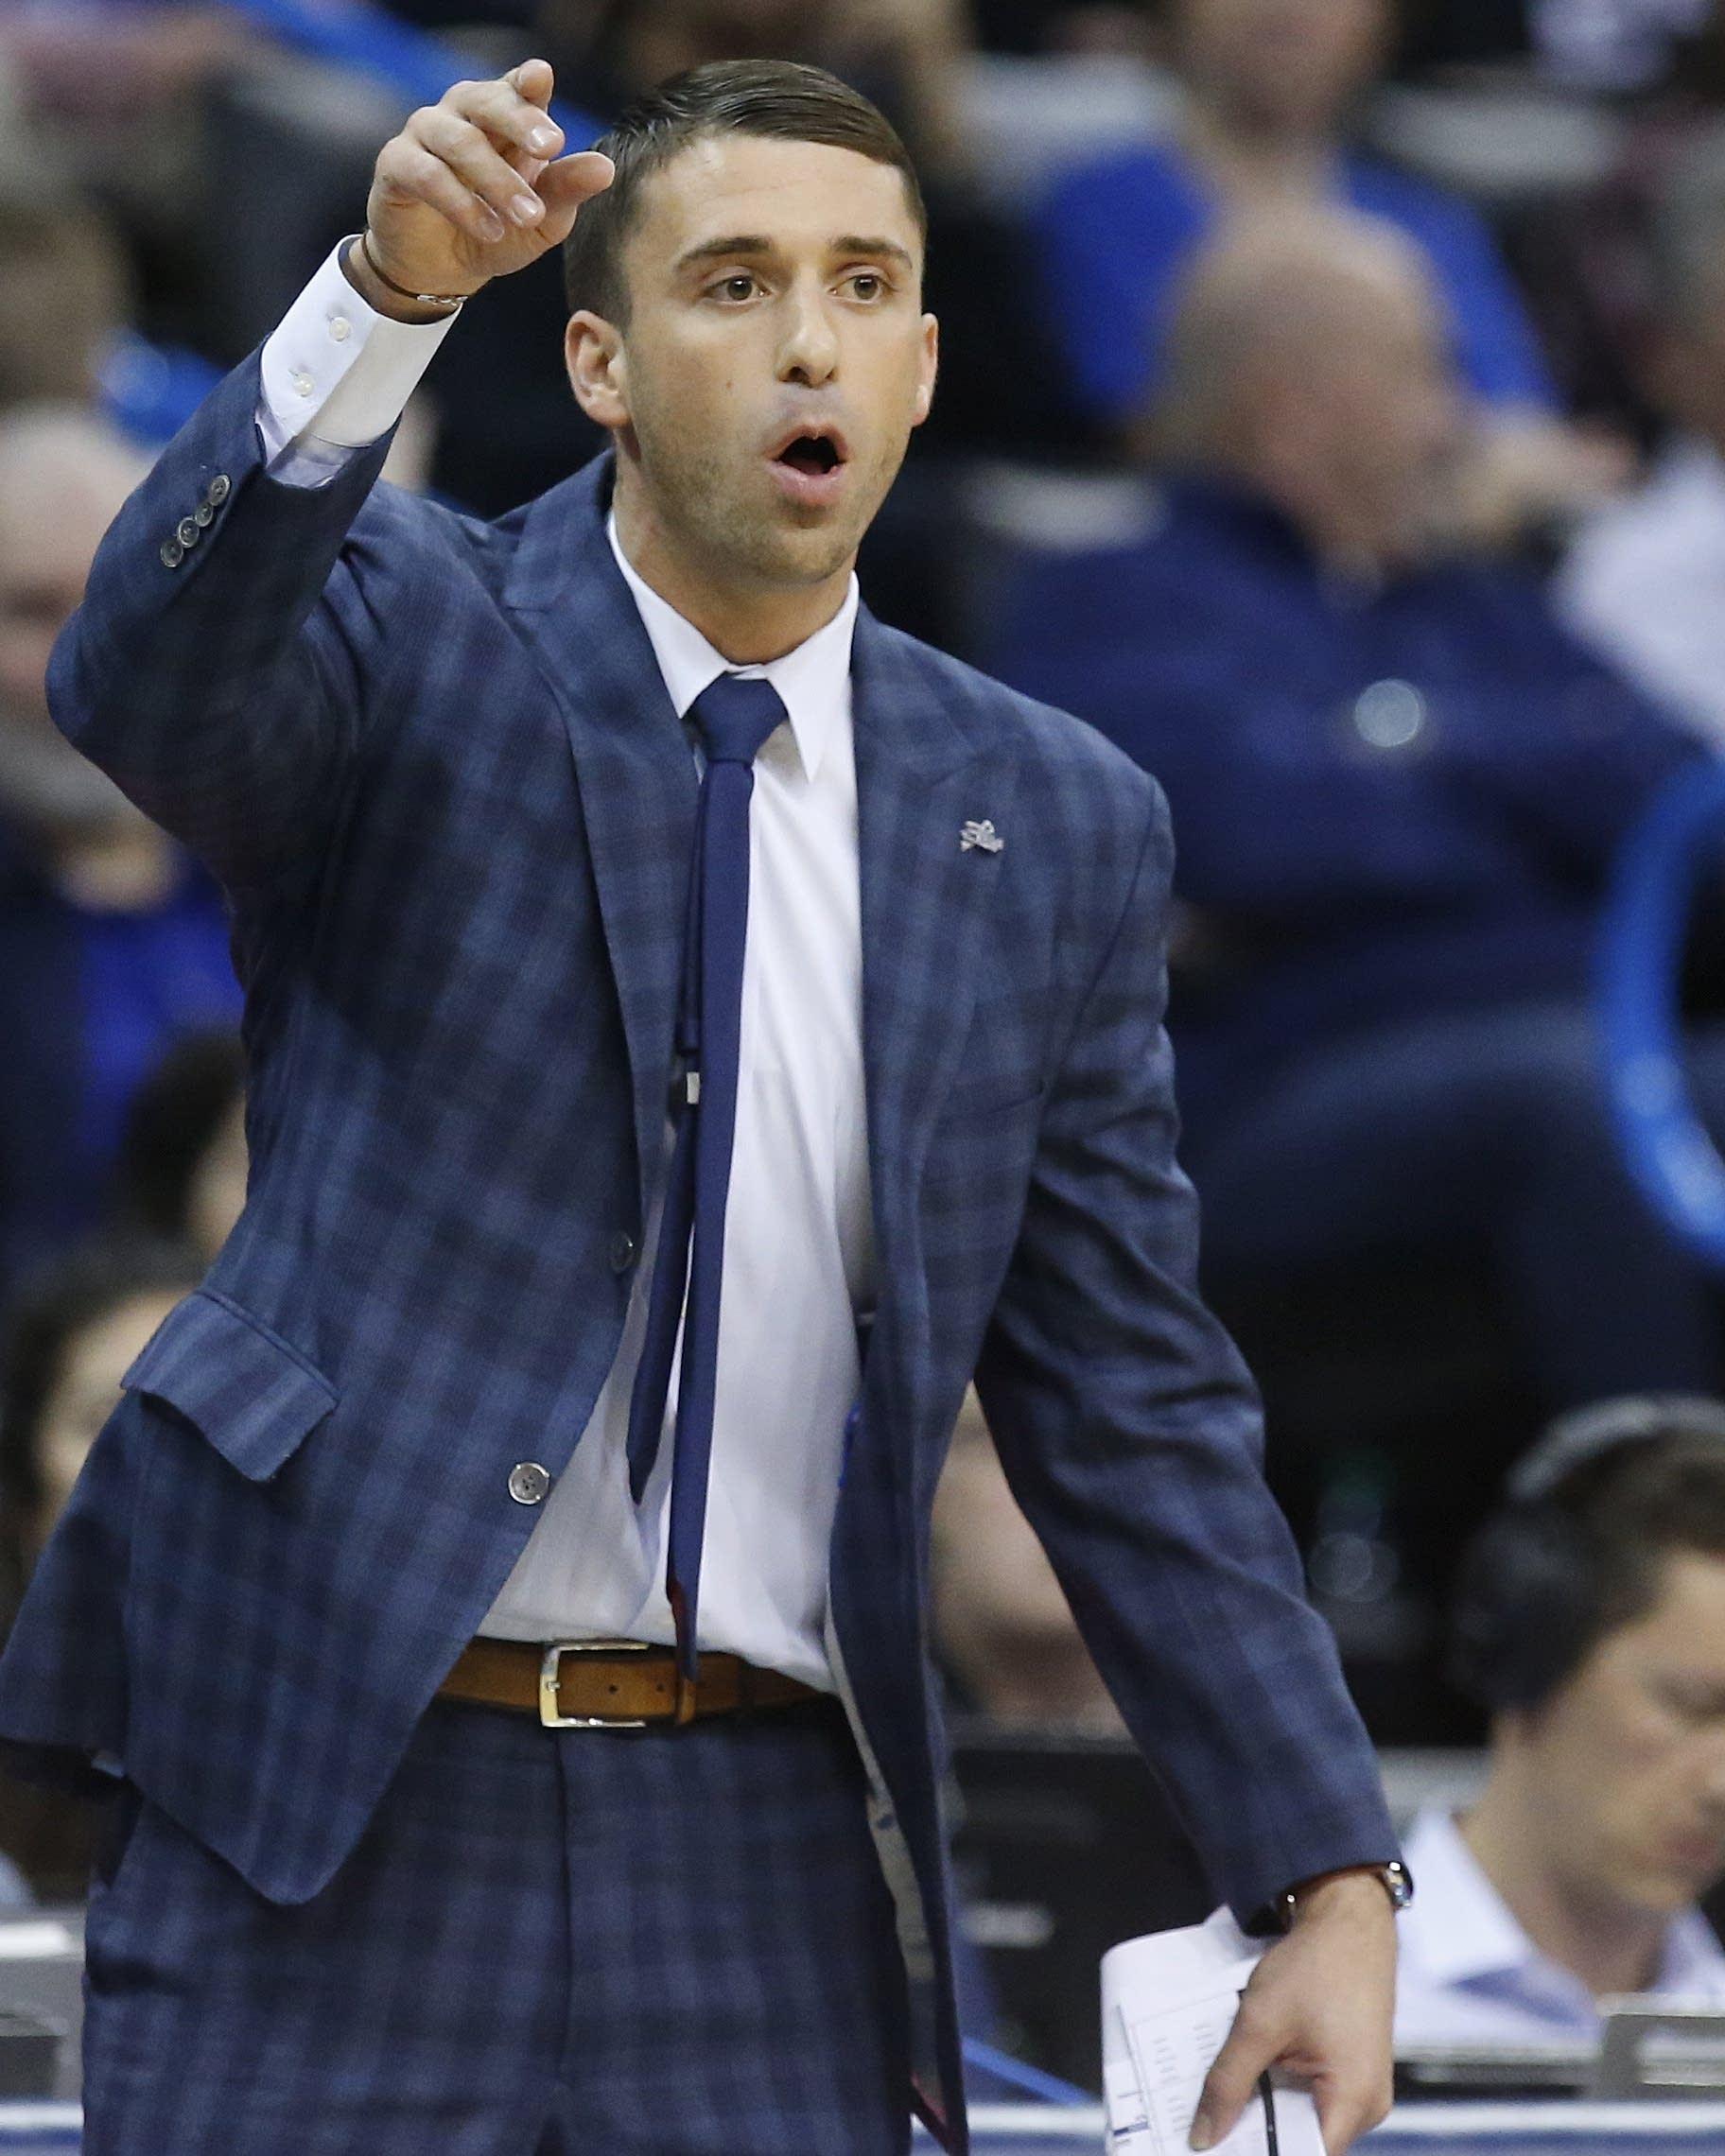 Timberwolves Retain Ryan Saunders 33 As Head Coach Mpr News